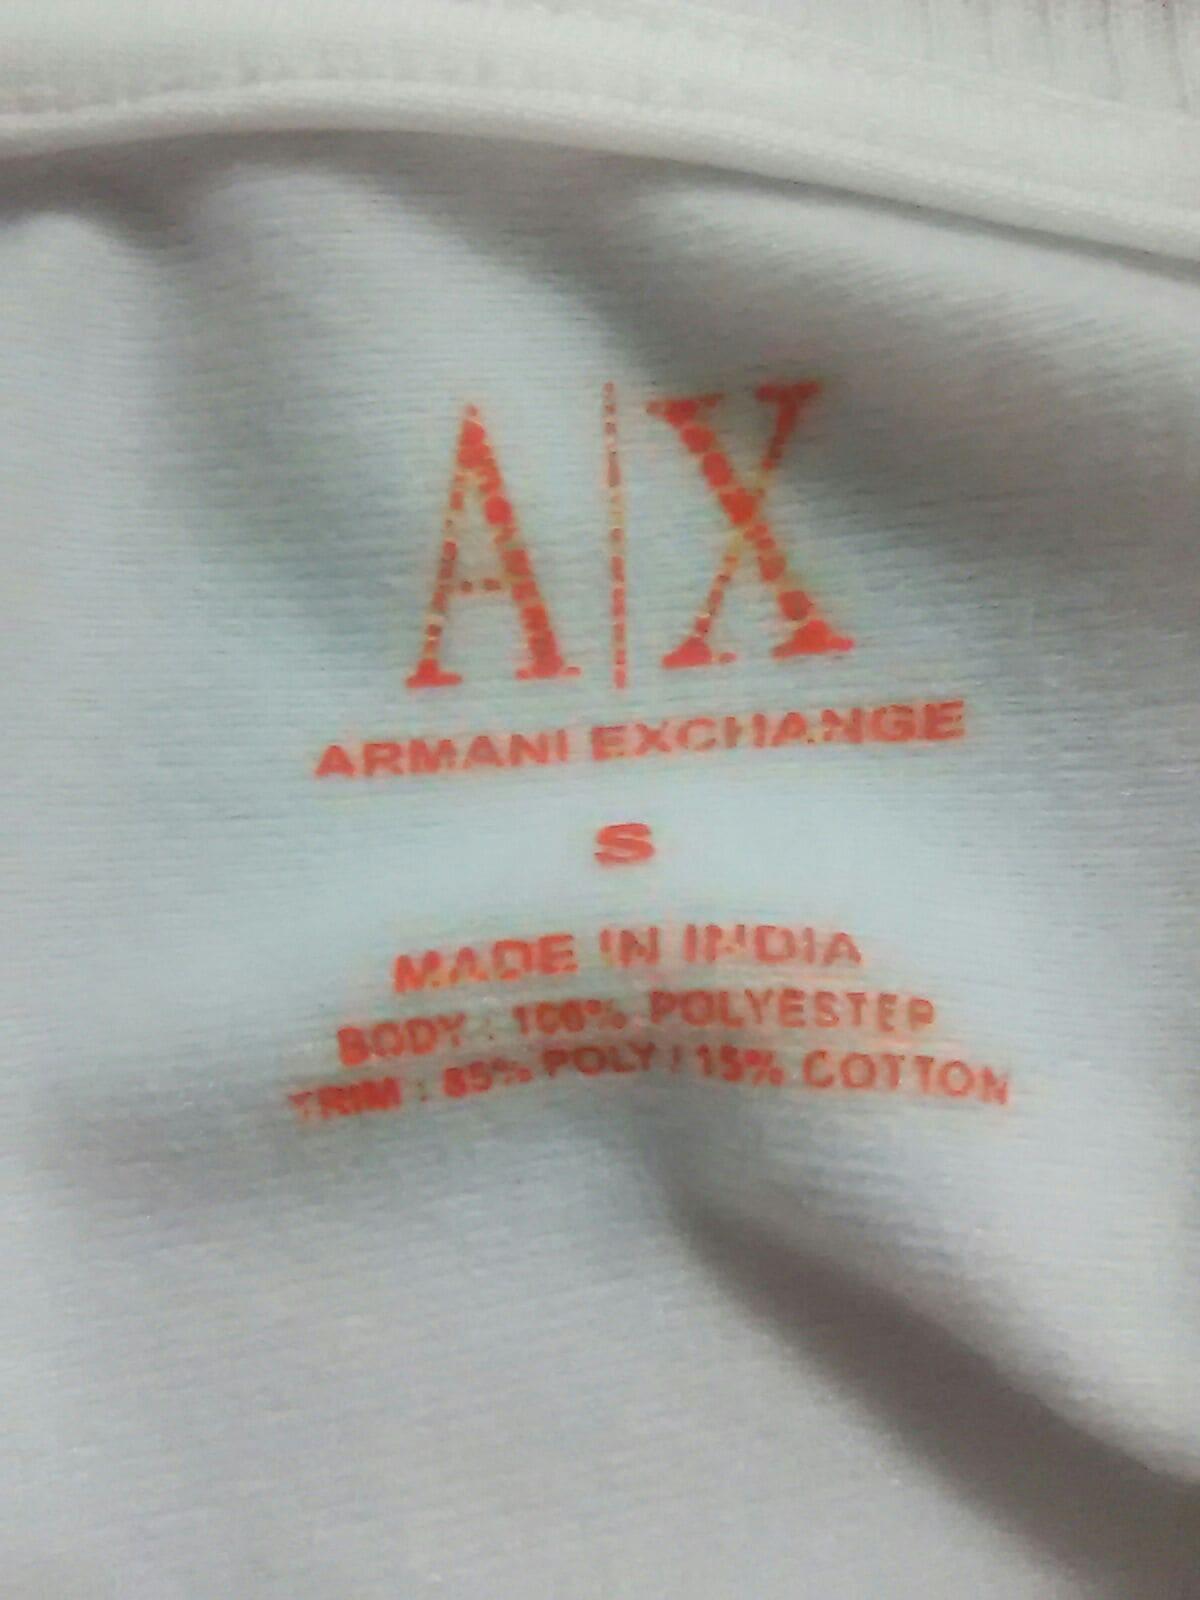 ARMANIEX(アルマーニエクスチェンジ)のジャージ